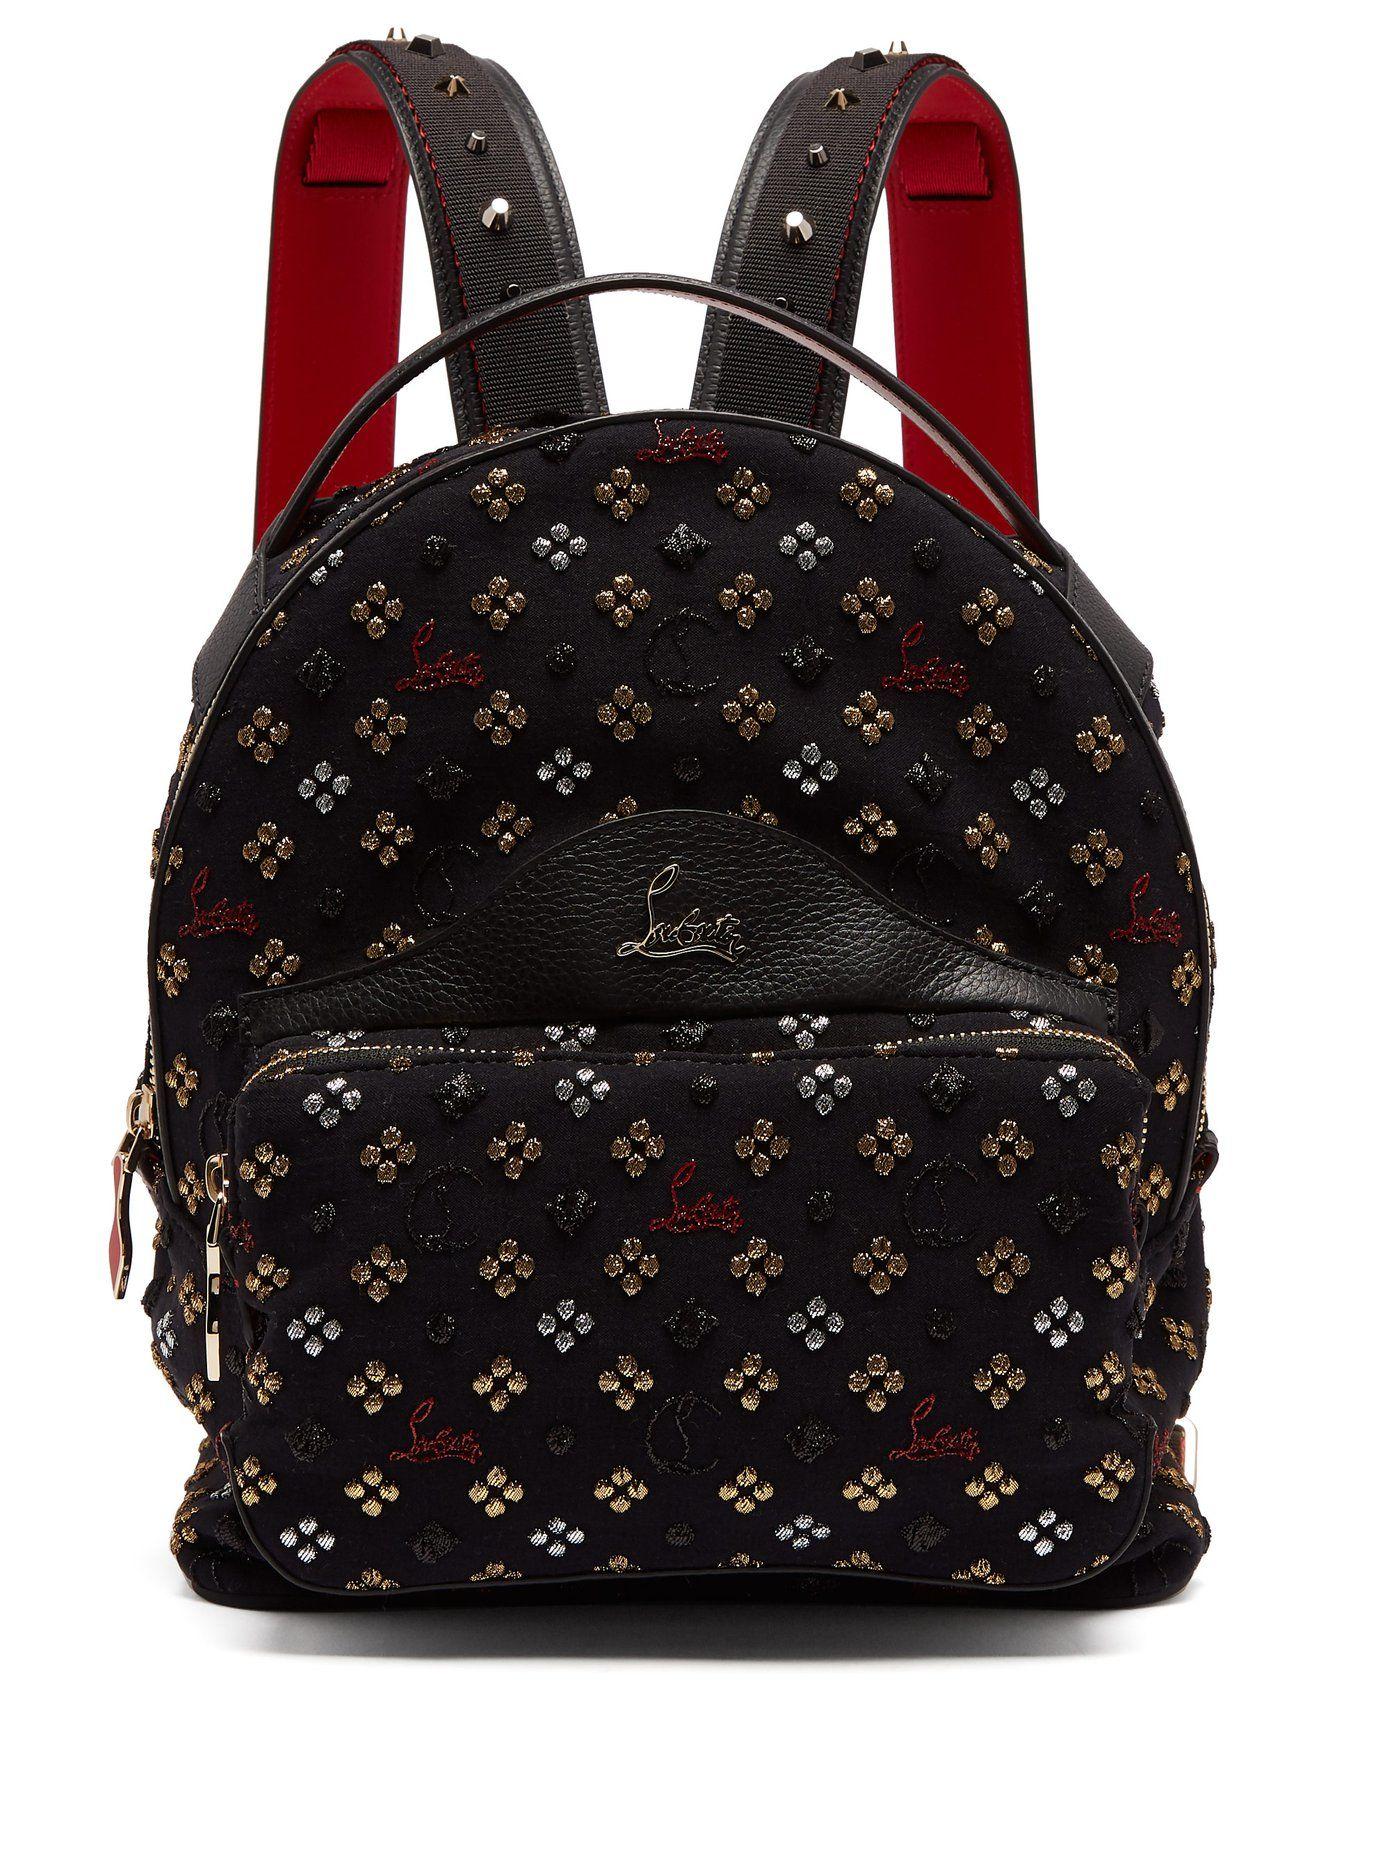 adc92af3ca9 Backloubi small glitter jacquard backpack | Christian Louboutin ...